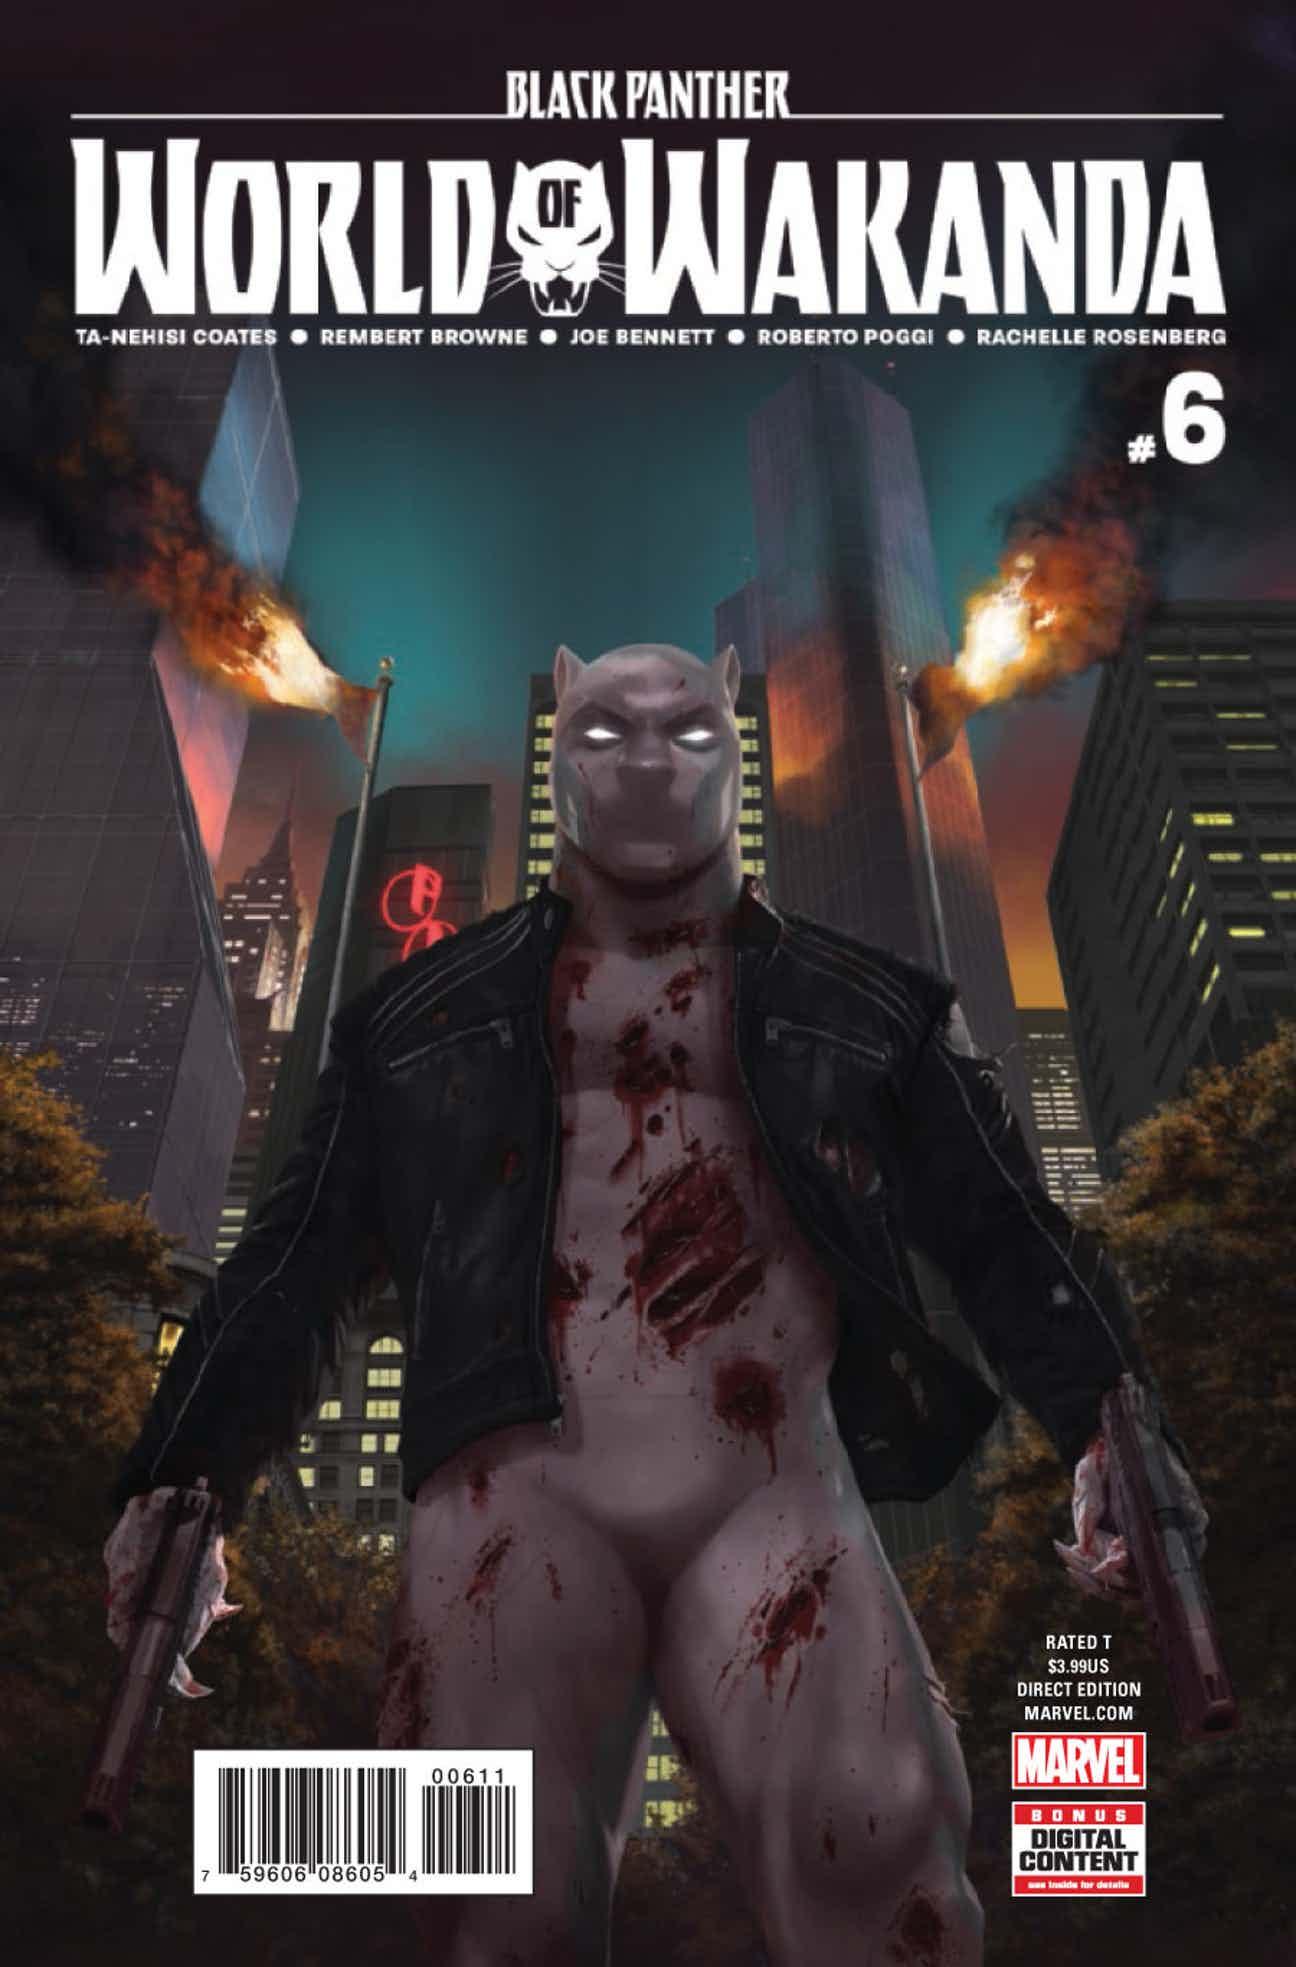 Black Panther: World of Wakanda #6 Review